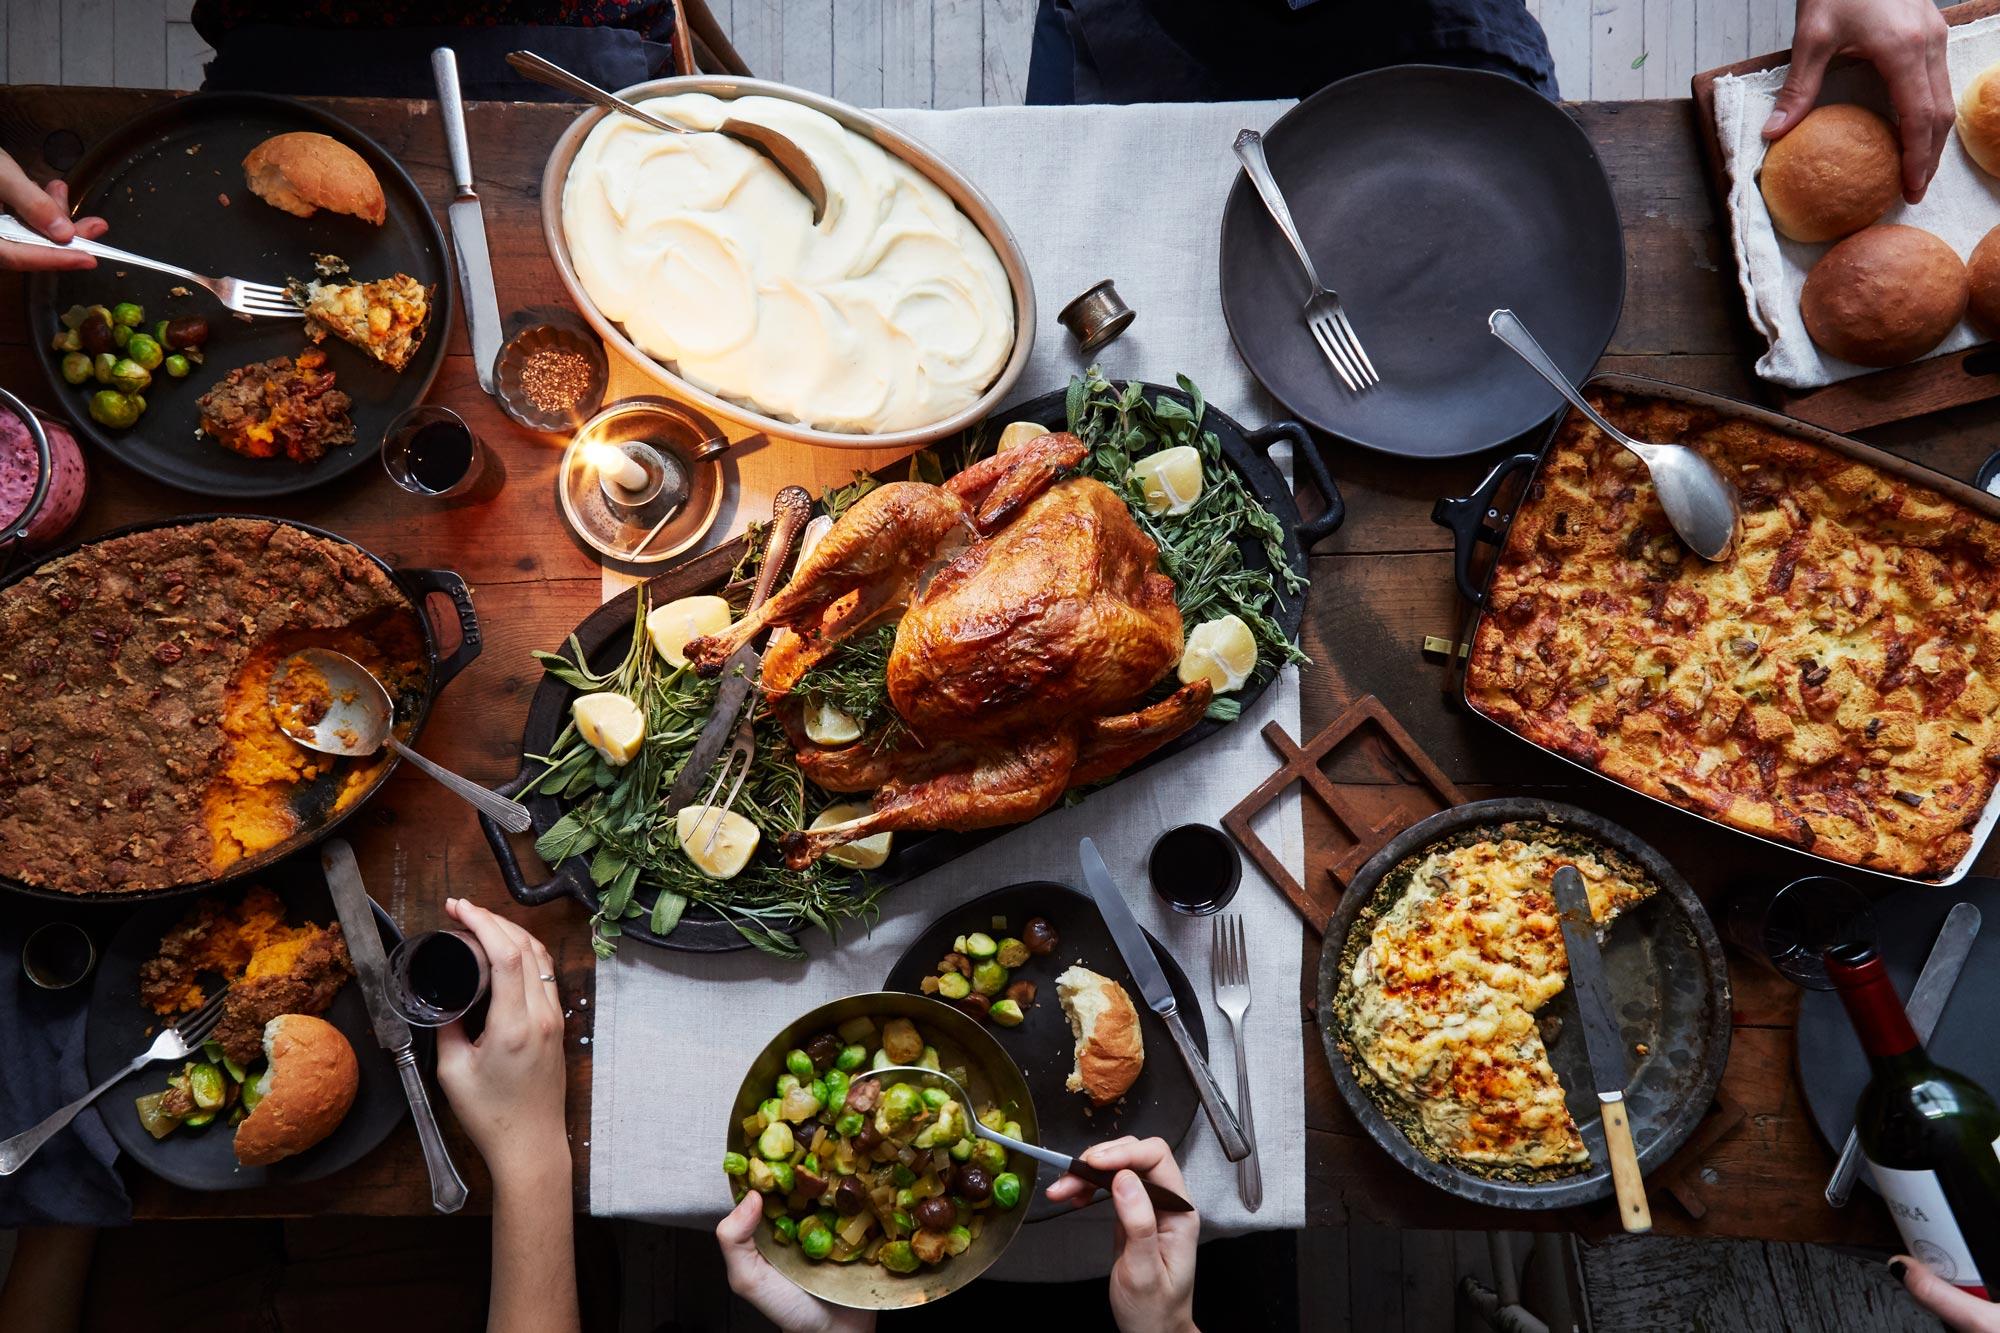 2015-1027_thanksgiving-table_bobbi-lin_32740002Orange.jpg